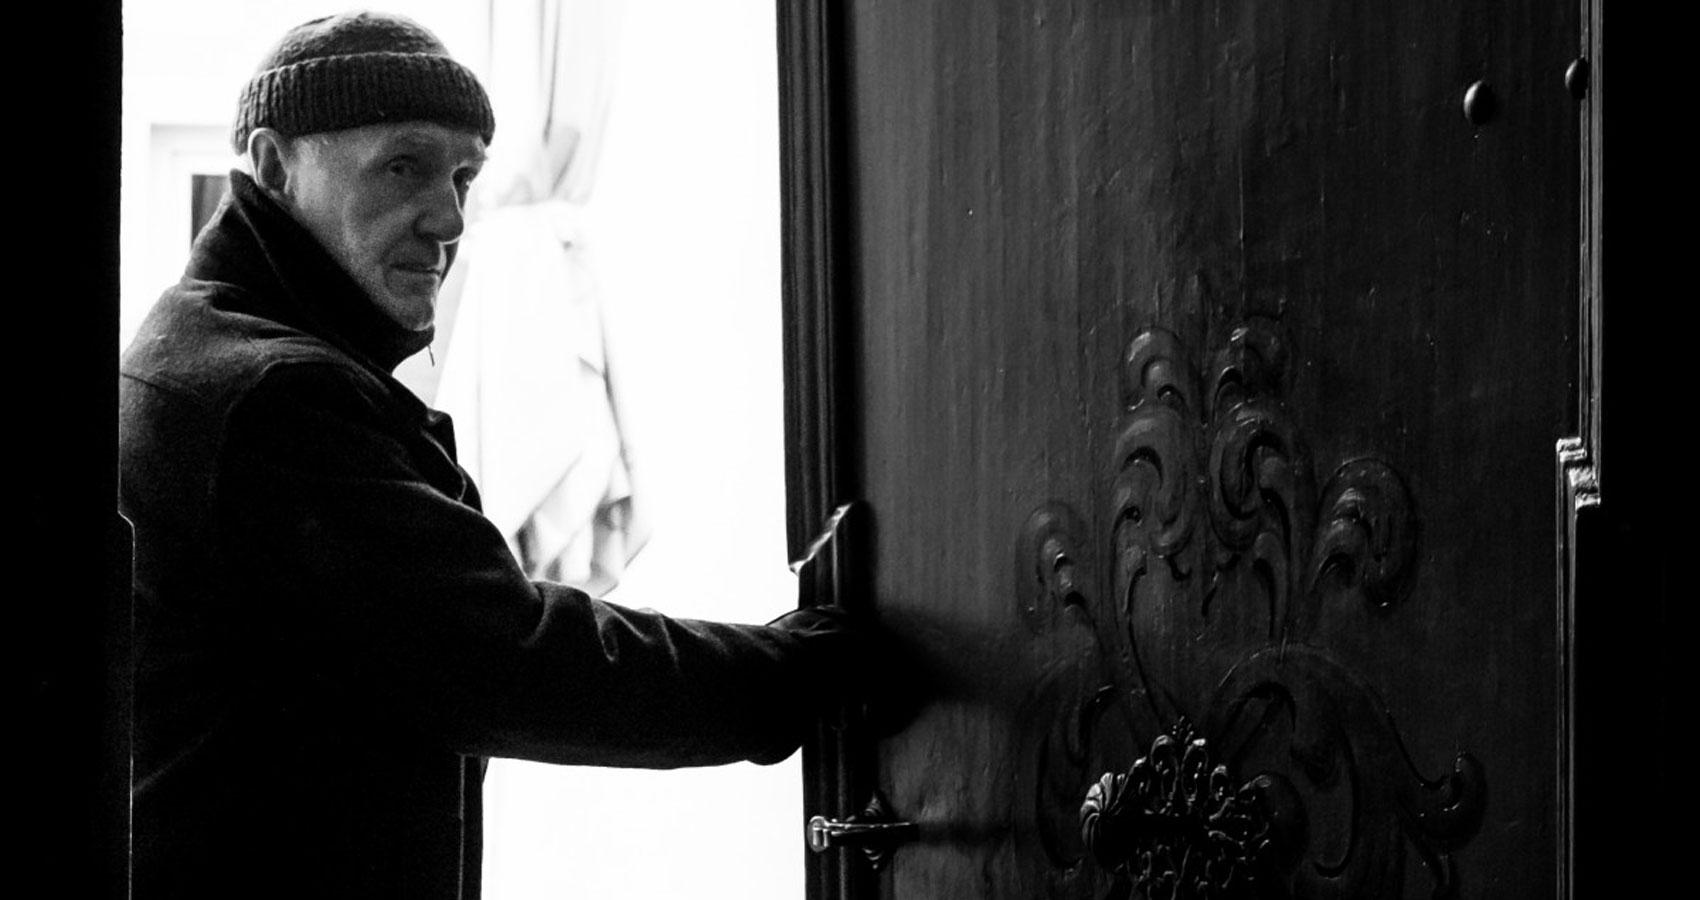 The Door, written by Patrick Doran at Spillwords.com